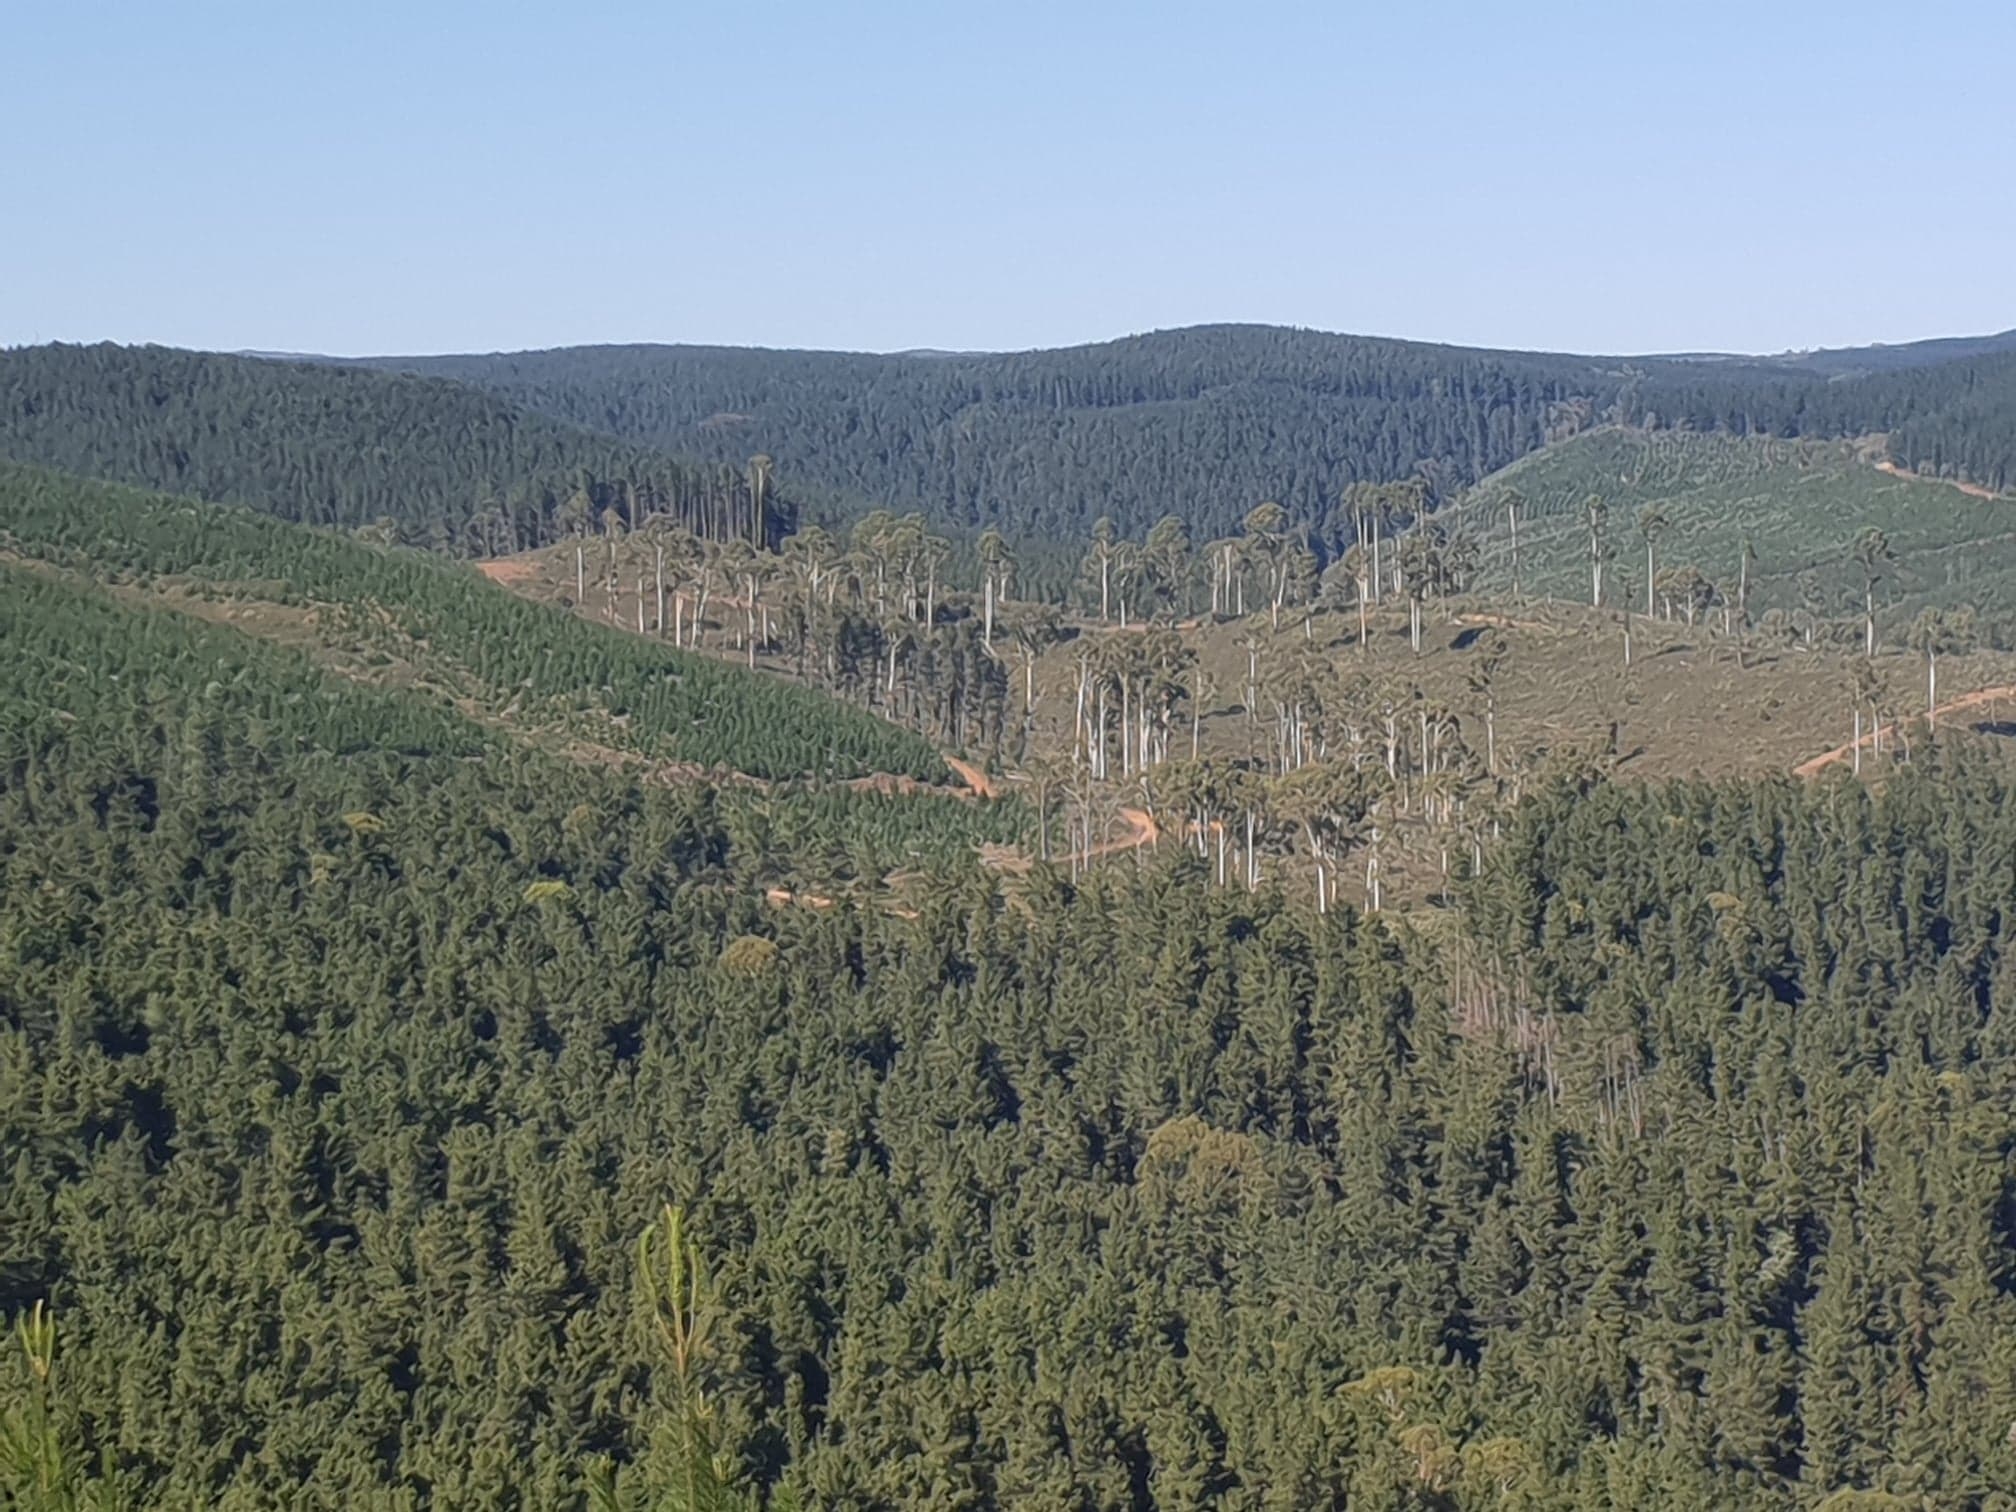 Bago forest